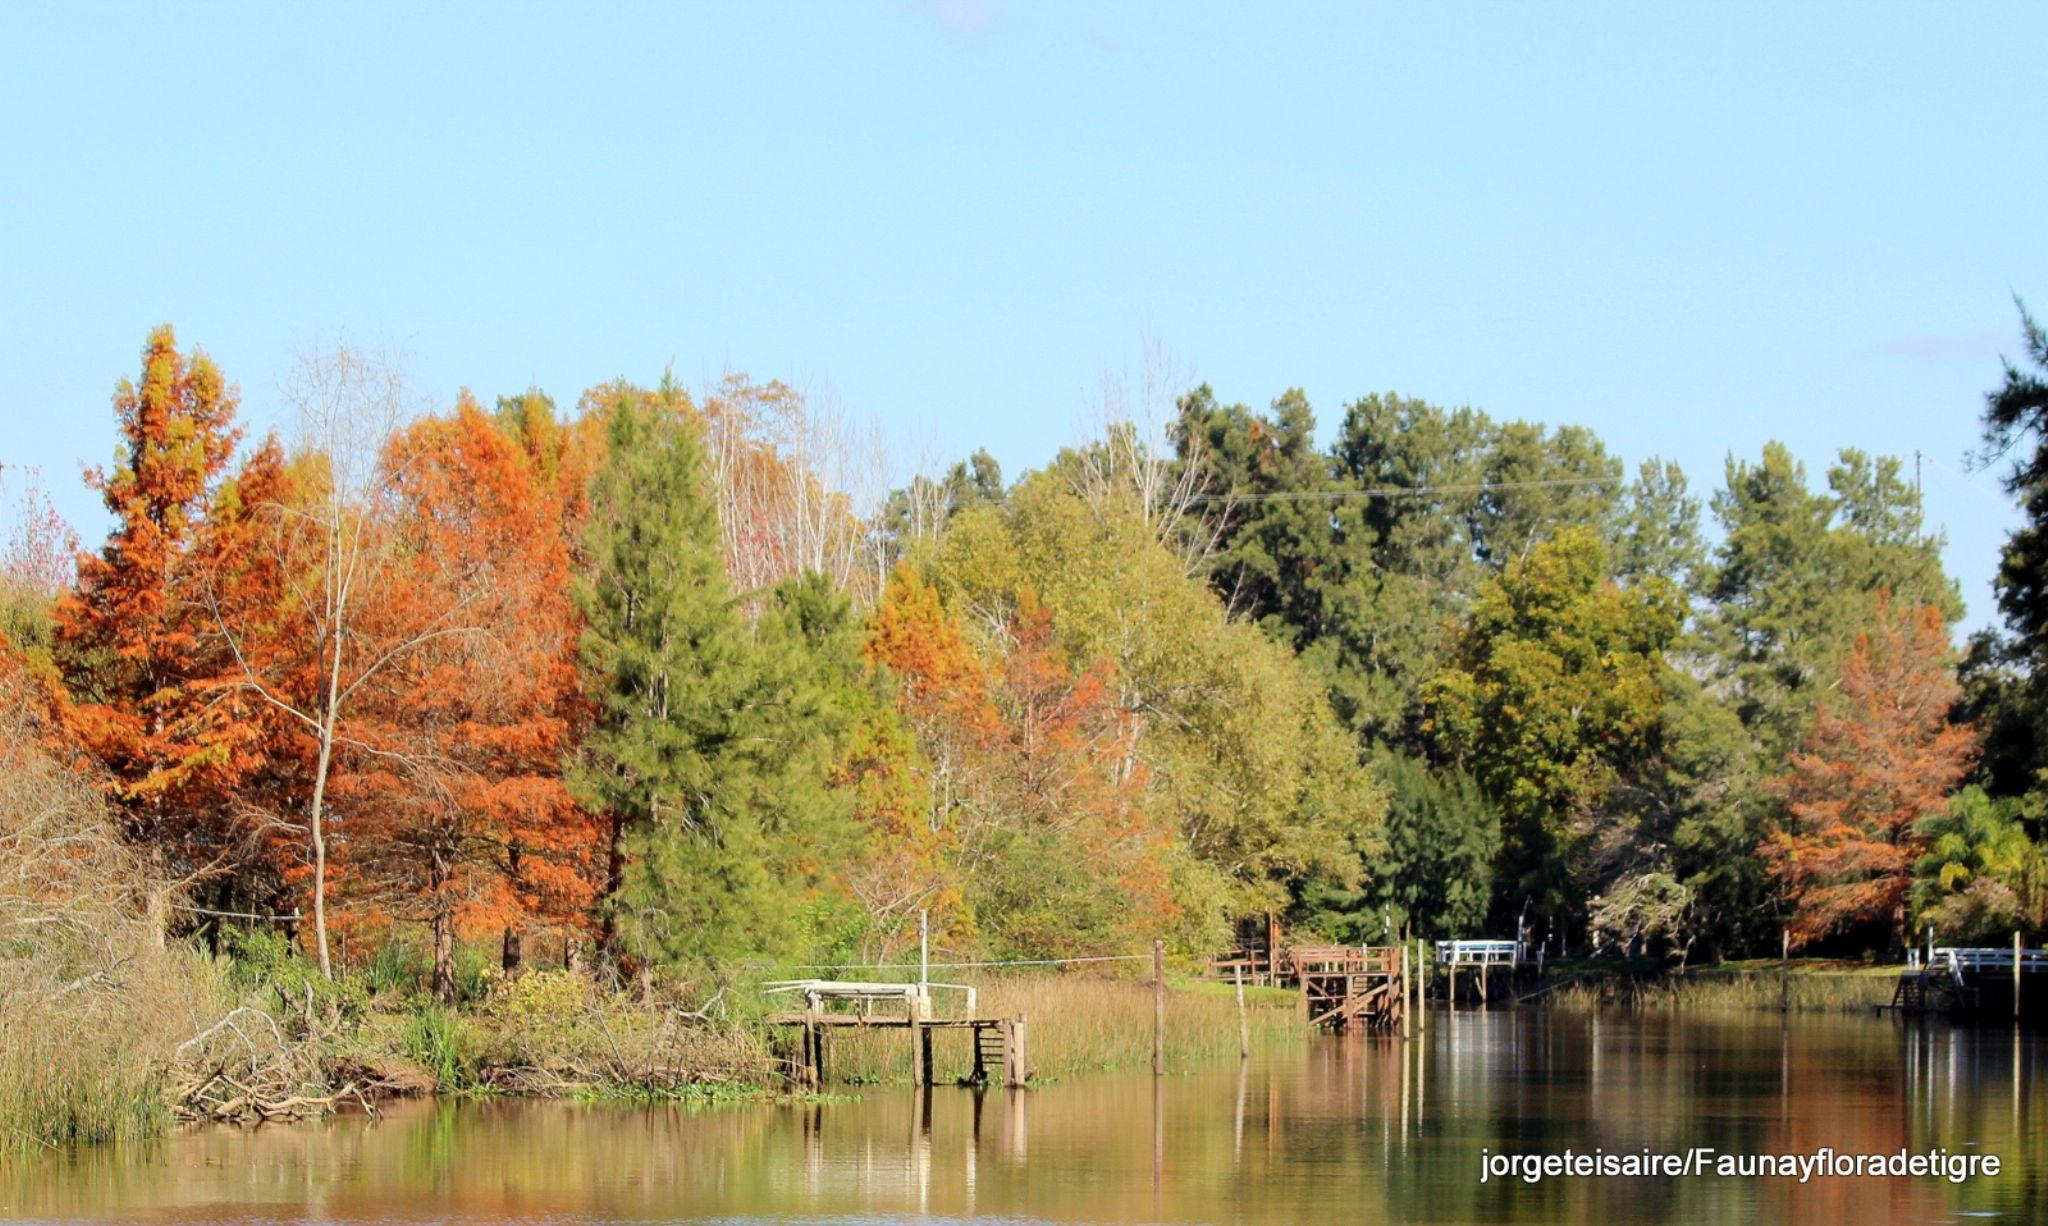 Aguas tranquilas en un dia de otoño by jorgeteisaire